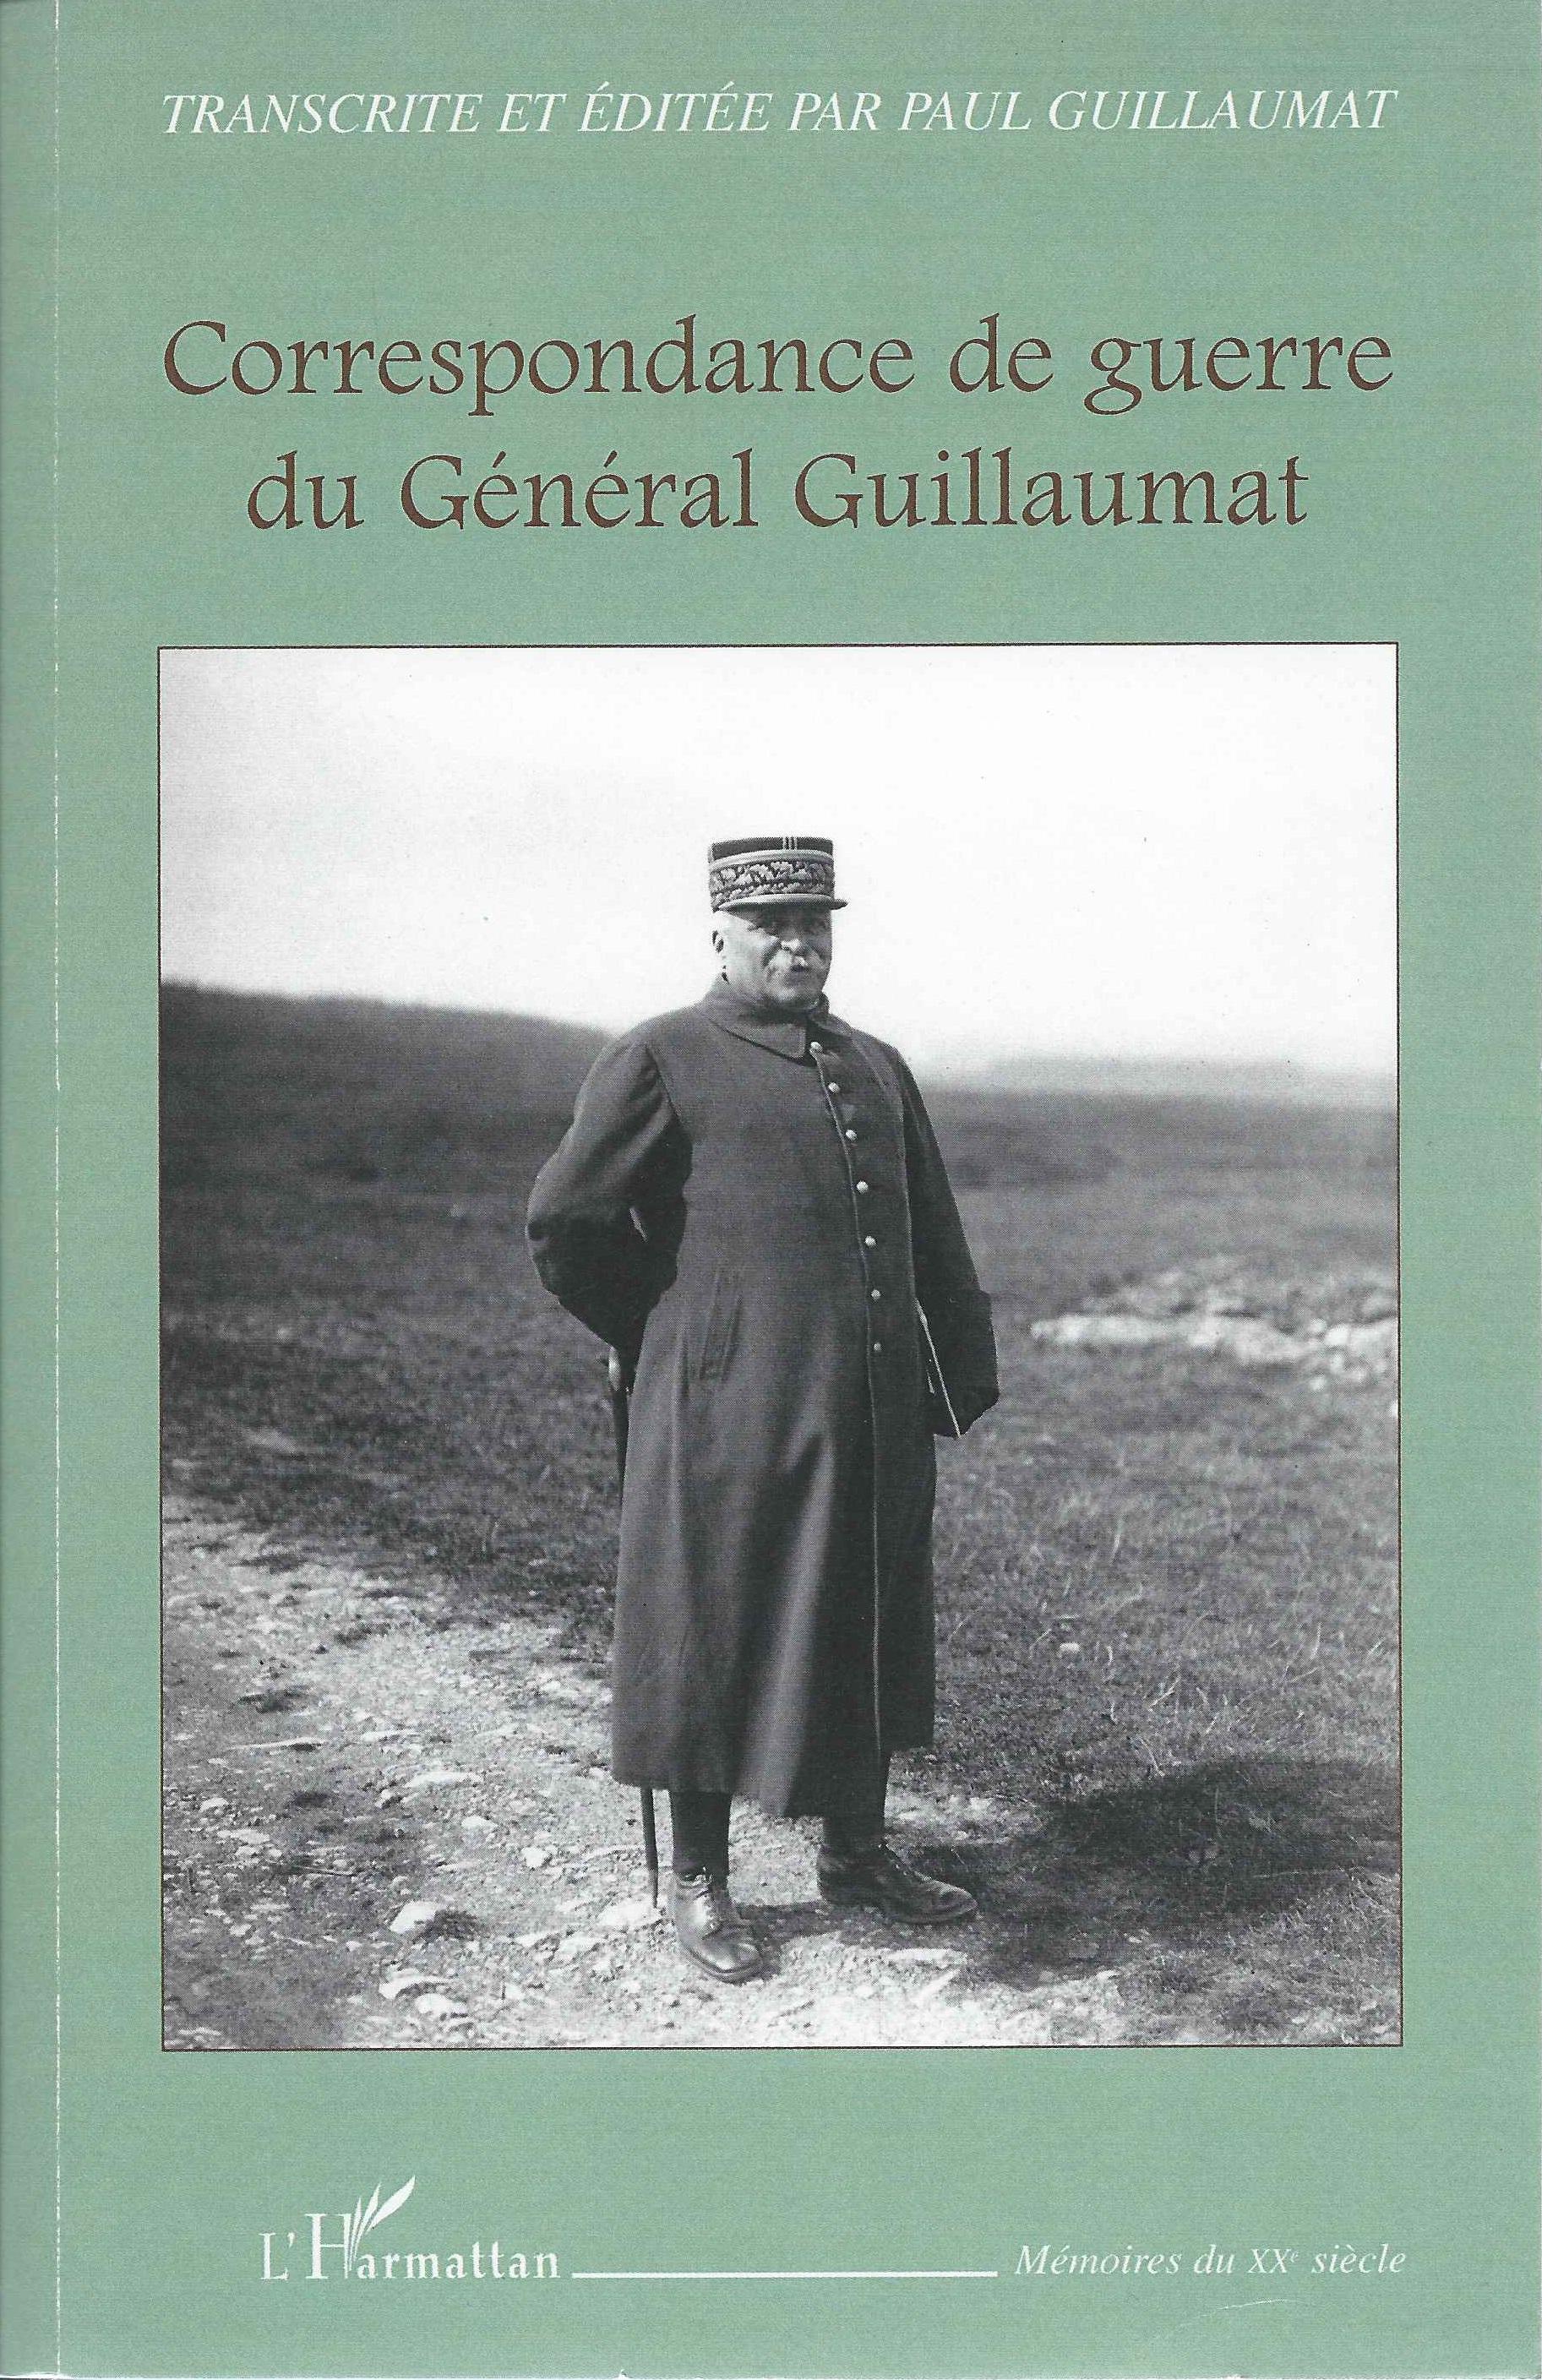 Adolphe Guillaumat Lettres et Journal Adolphe GUILLAUMAT Correspondance